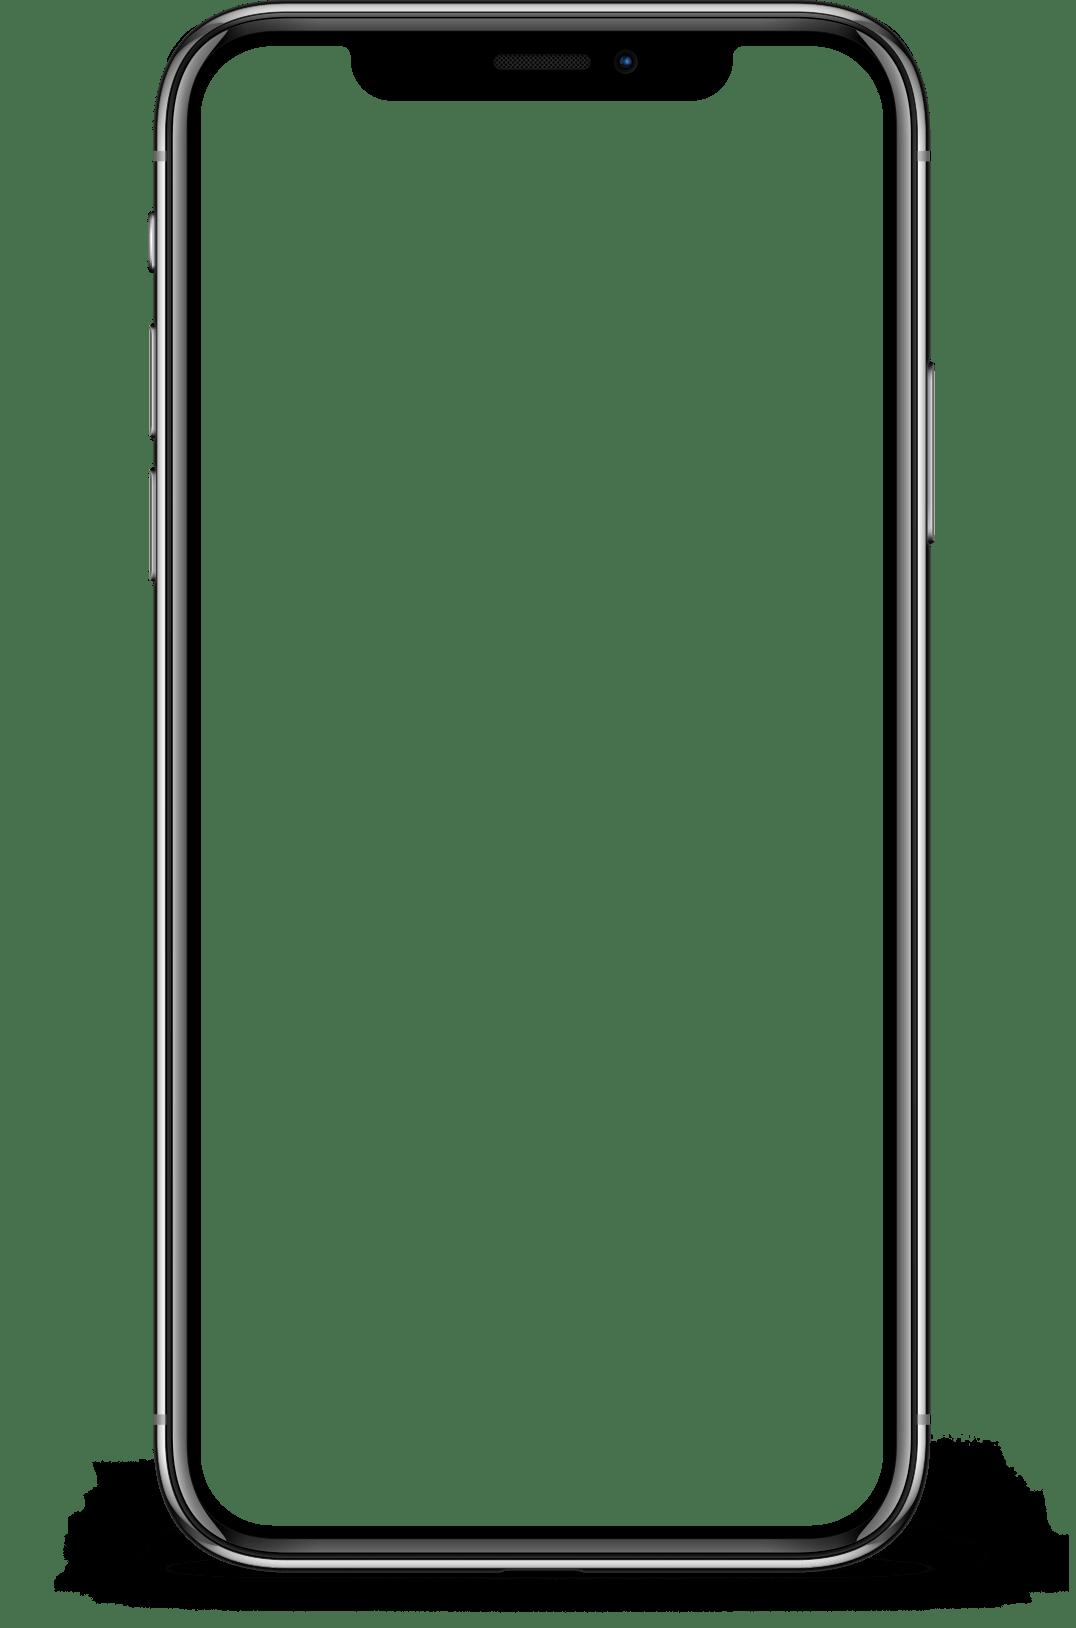 Png Iphone X Transparent Phone Template Iphone Transparent Case Iphone Mockup